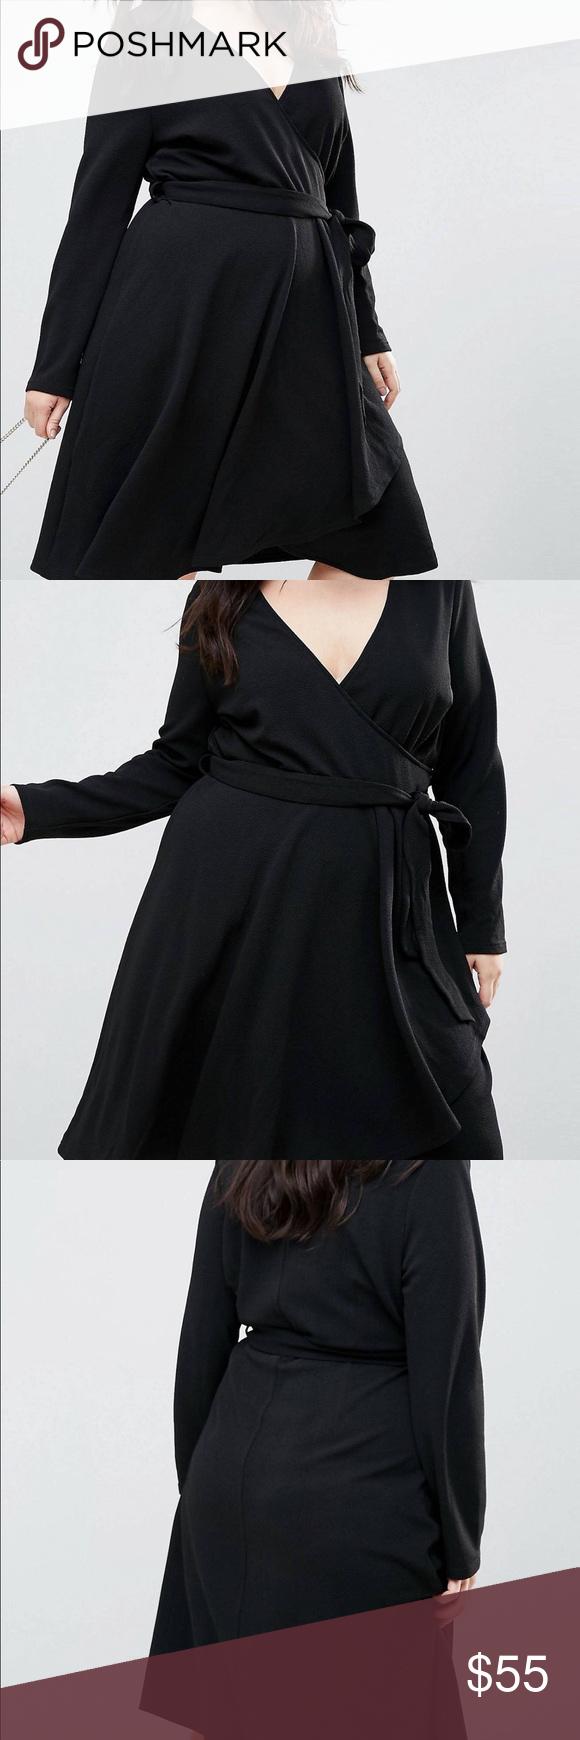 Asos curve black wrap dress new never worn nwt my posh picks